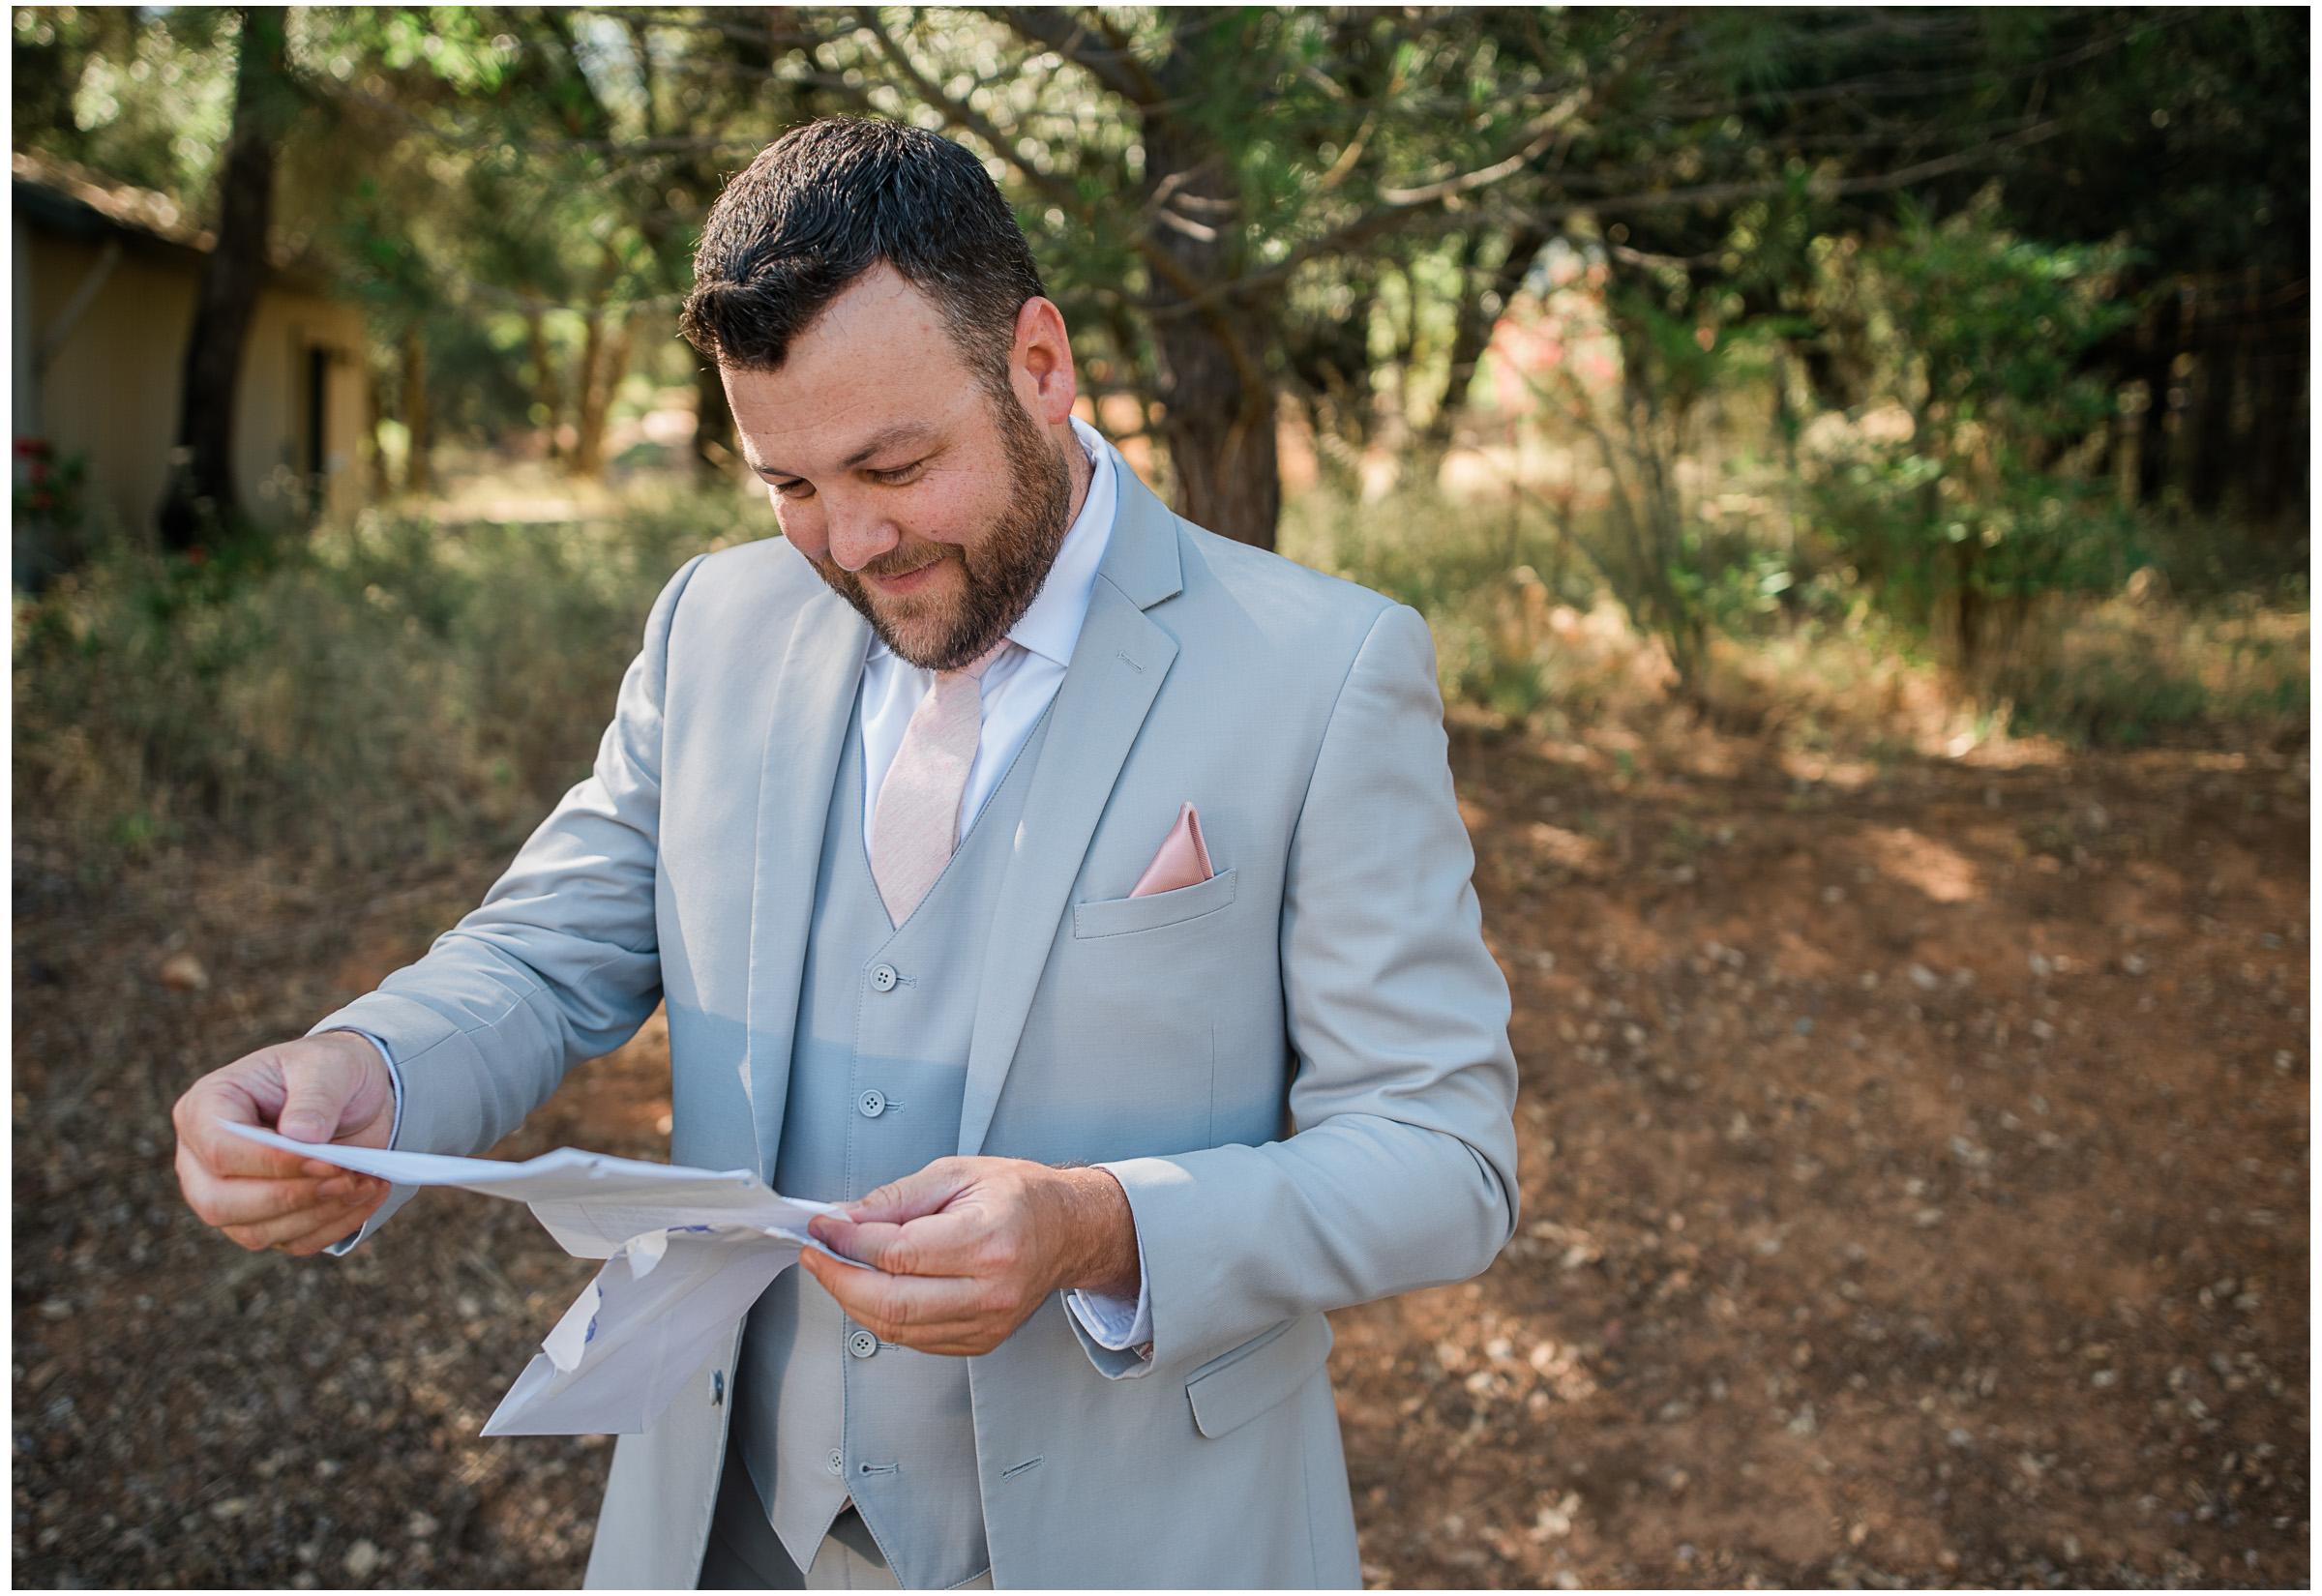 Placerville Wedding - Sacramento Photographer - Justin Wilcox Photography - 7.jpg